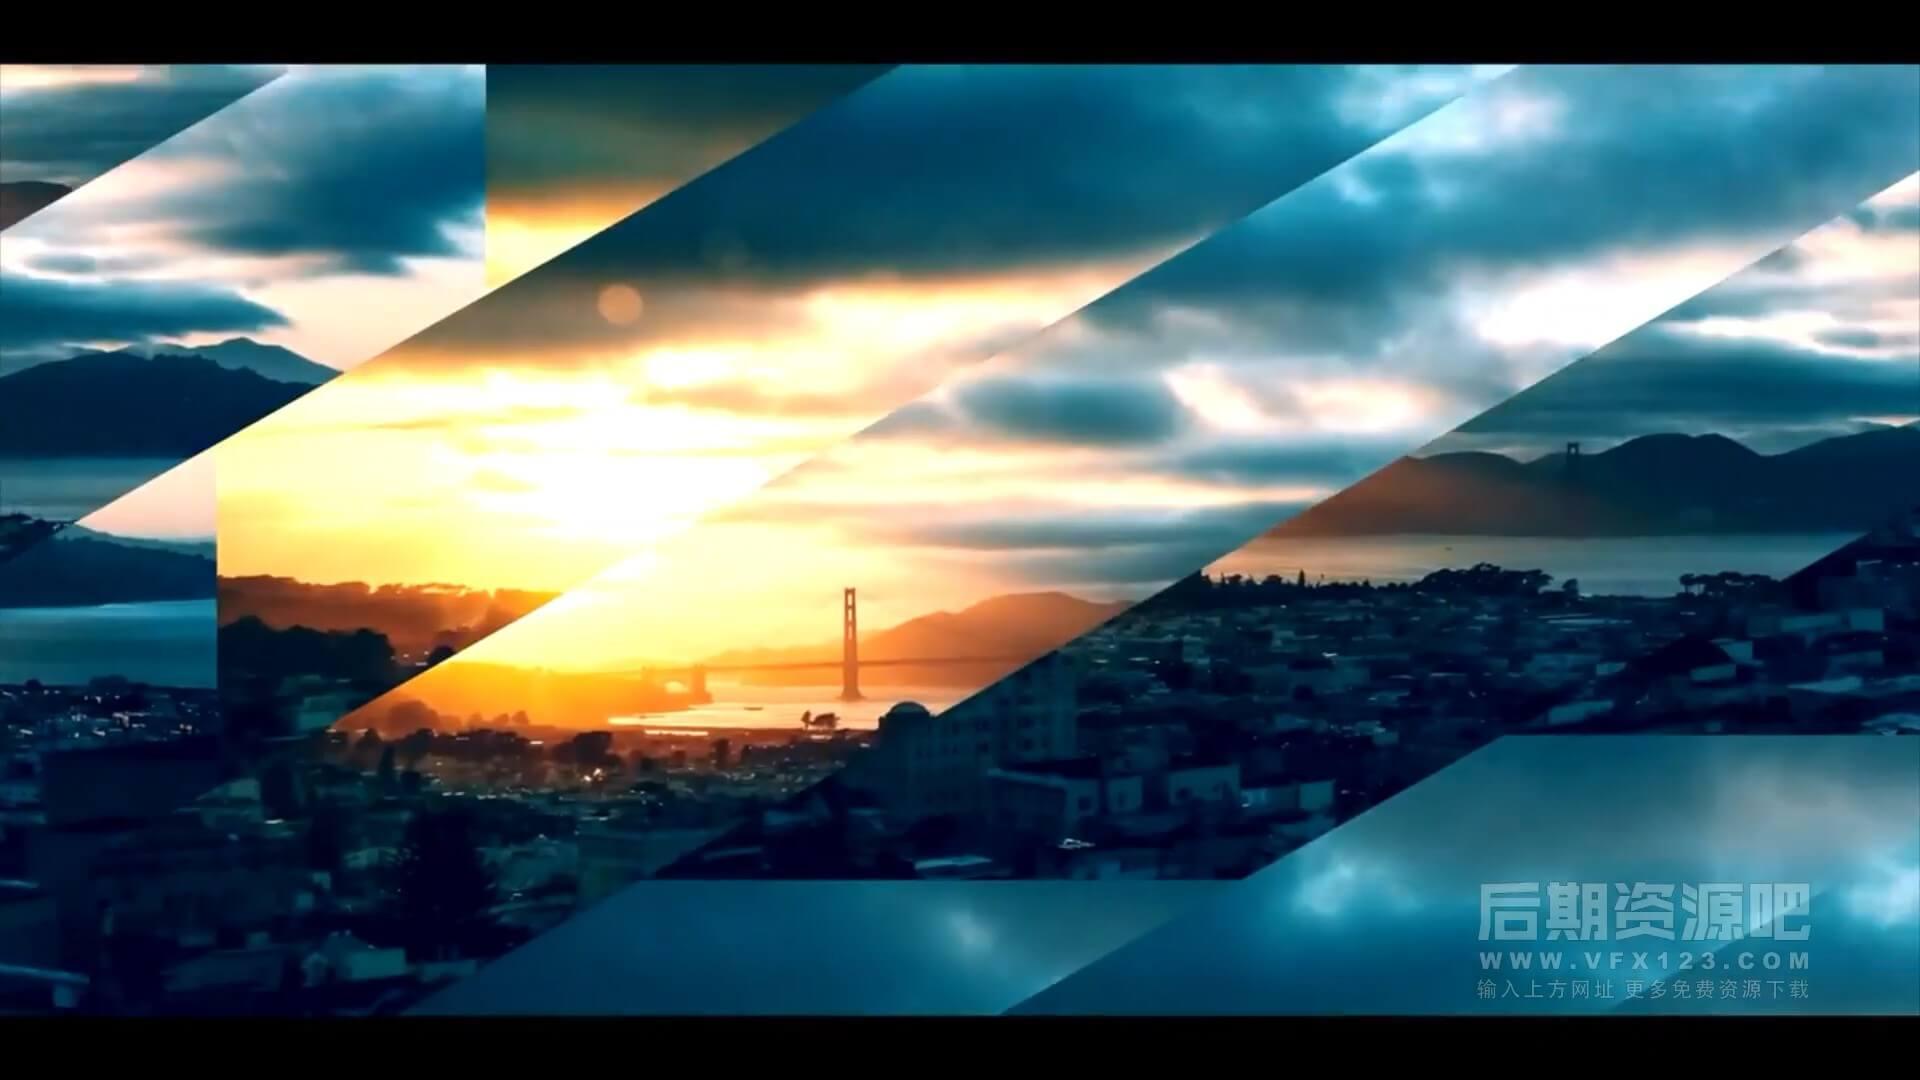 Fcpx转场插件 10组切割画面动画效果过渡转场预设 Cut Transitions